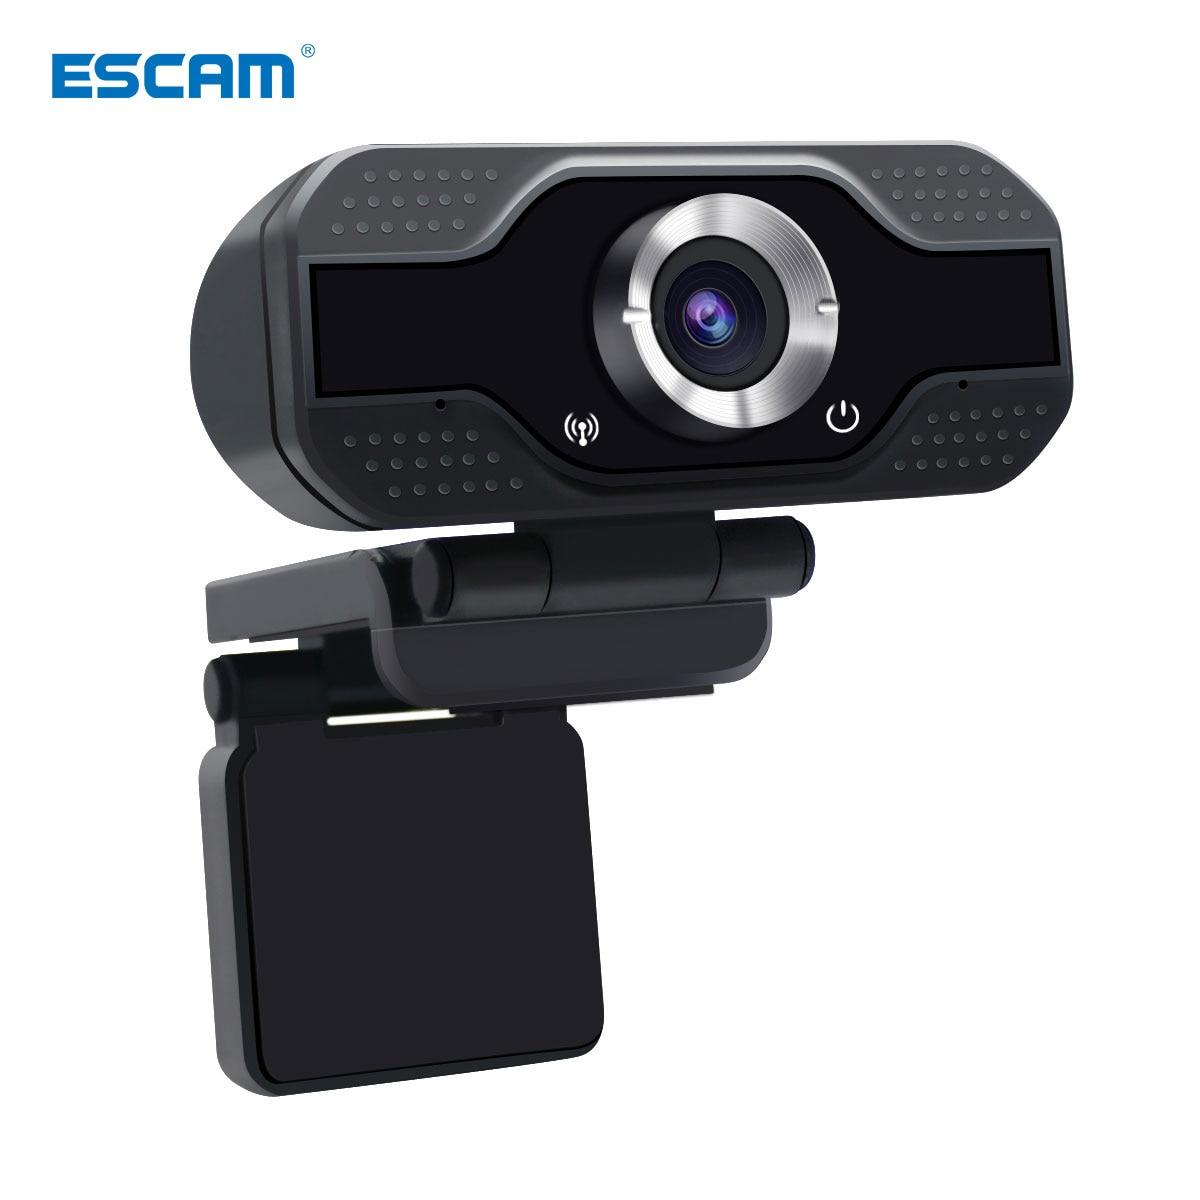 ESCAM PVR006 1080p 2MP H.264 Portable Mini Webcam HD 1080p Web PC Camera Convenient Live Broadcast with Microphone Digital